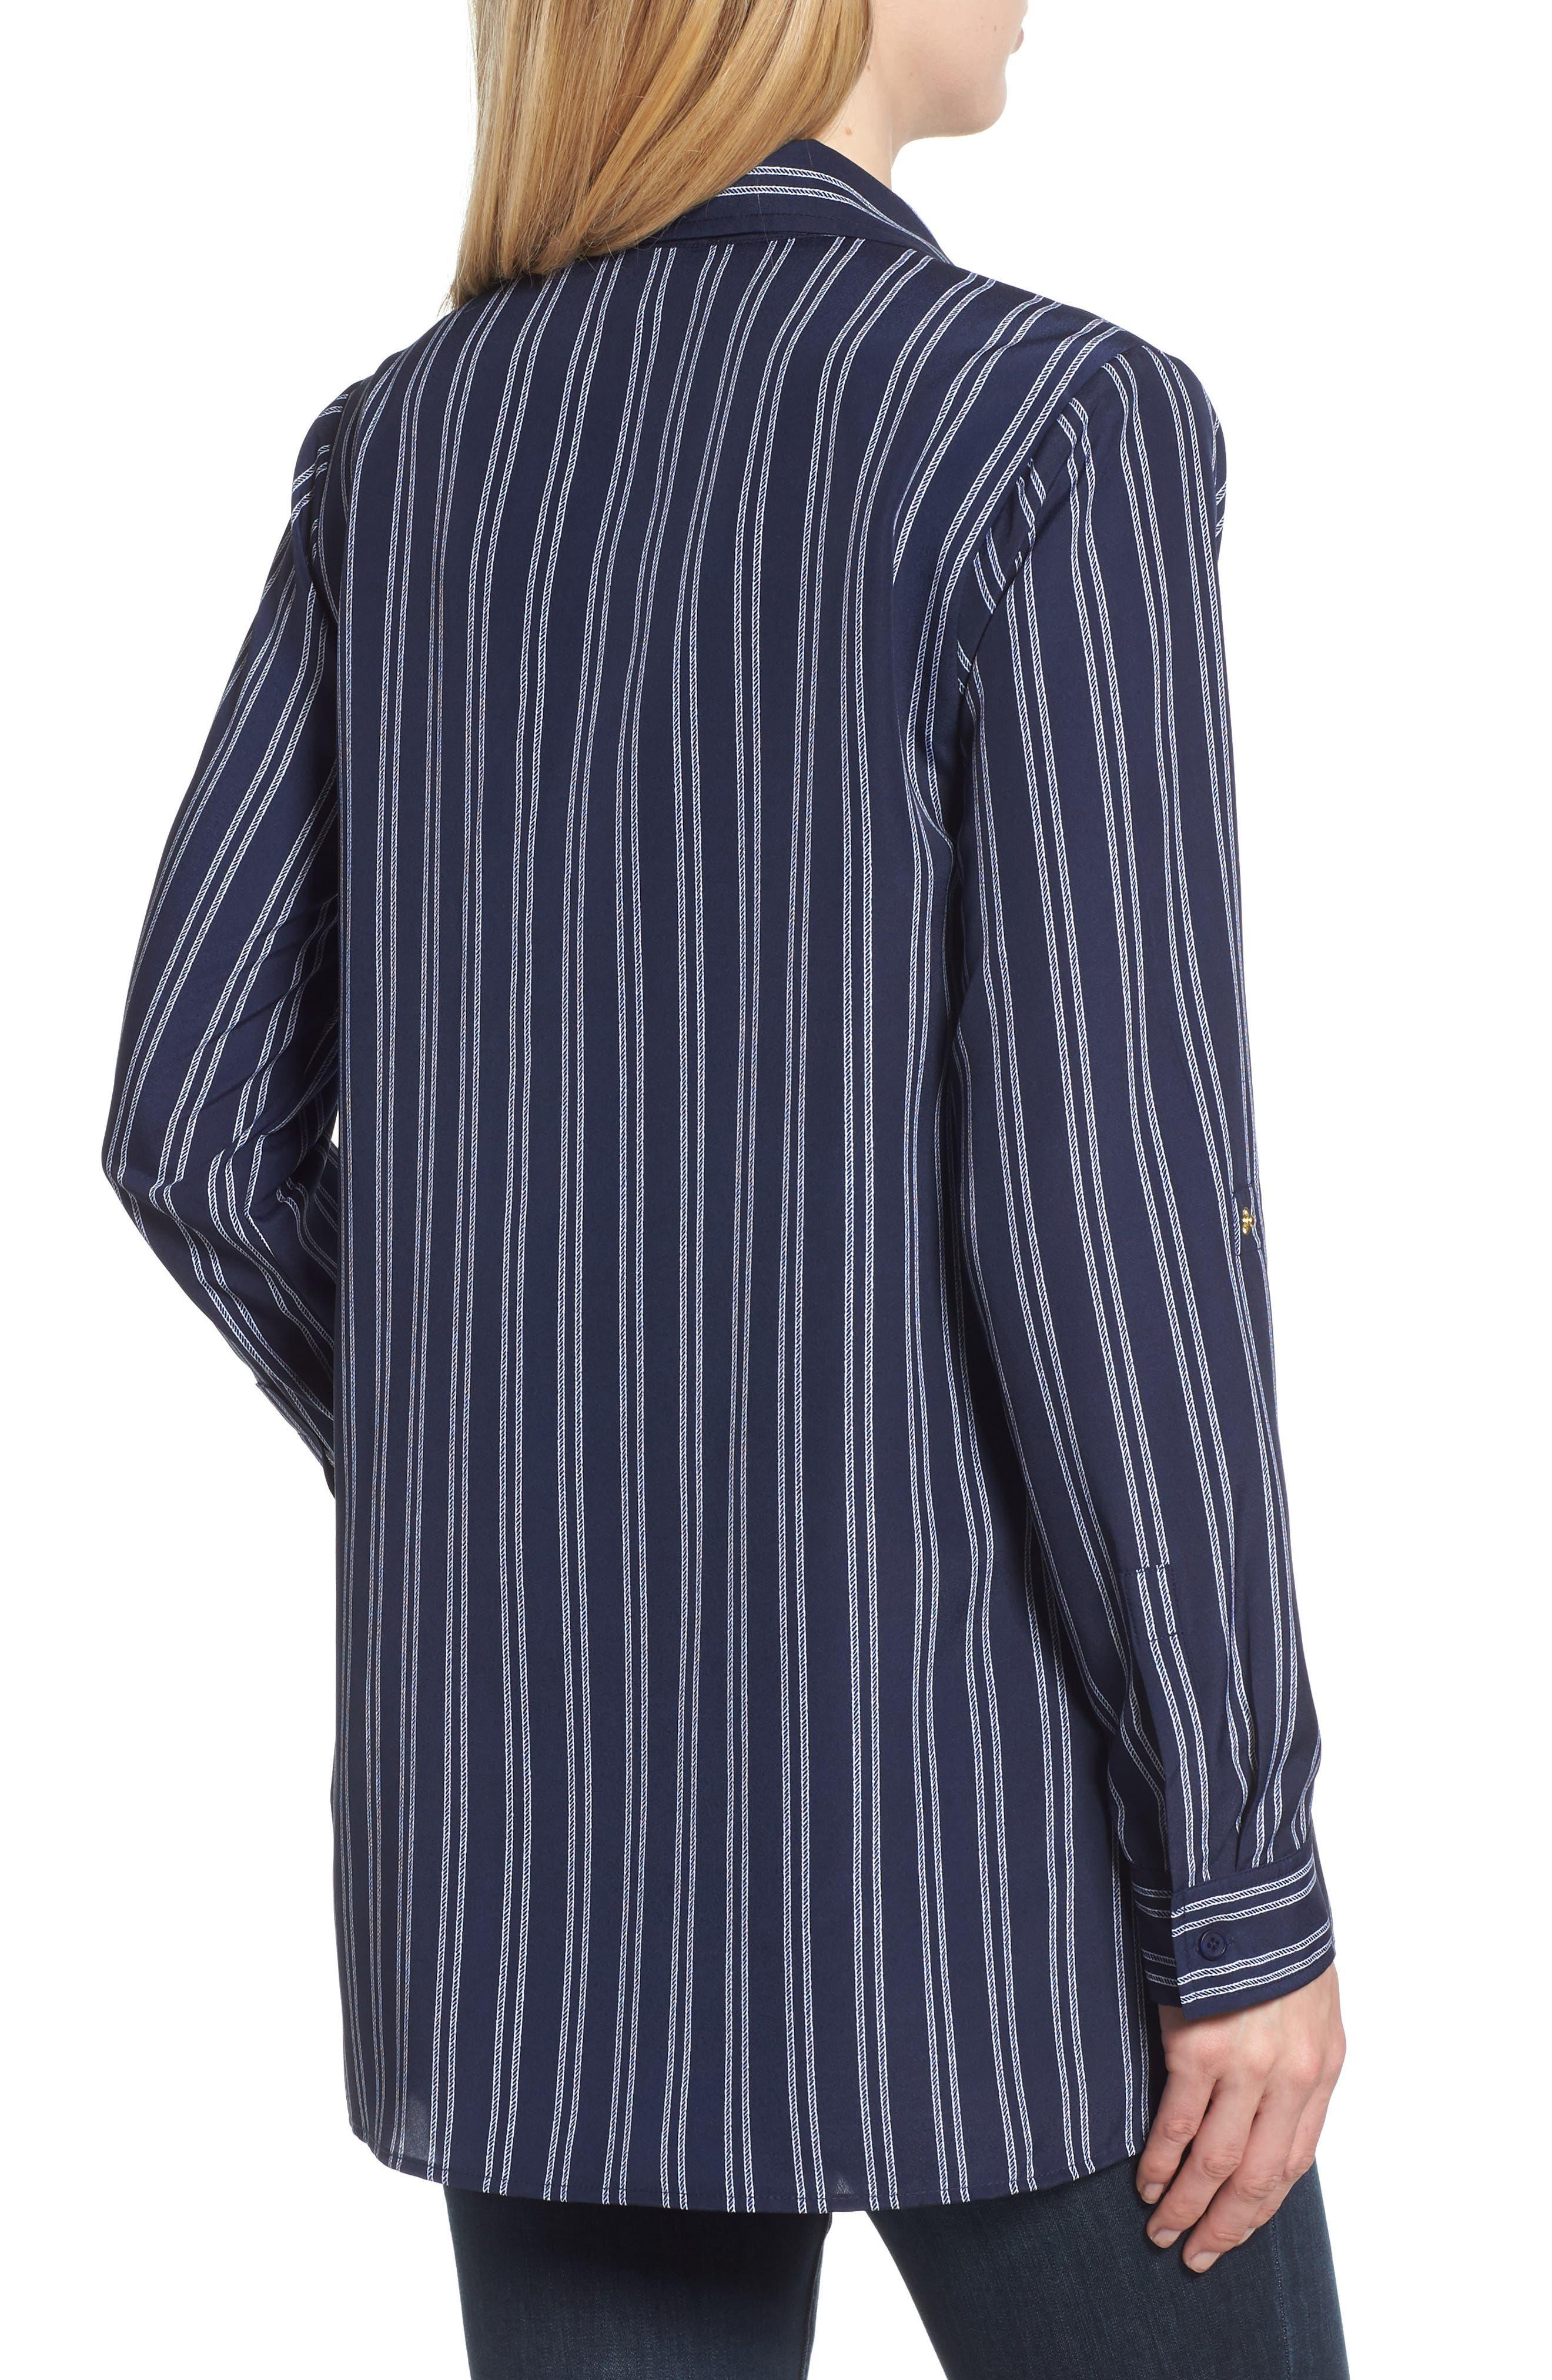 MICHAEL Michael Kors Bengal Striped Shirt,                             Alternate thumbnail 2, color,                             TRUE NAVY